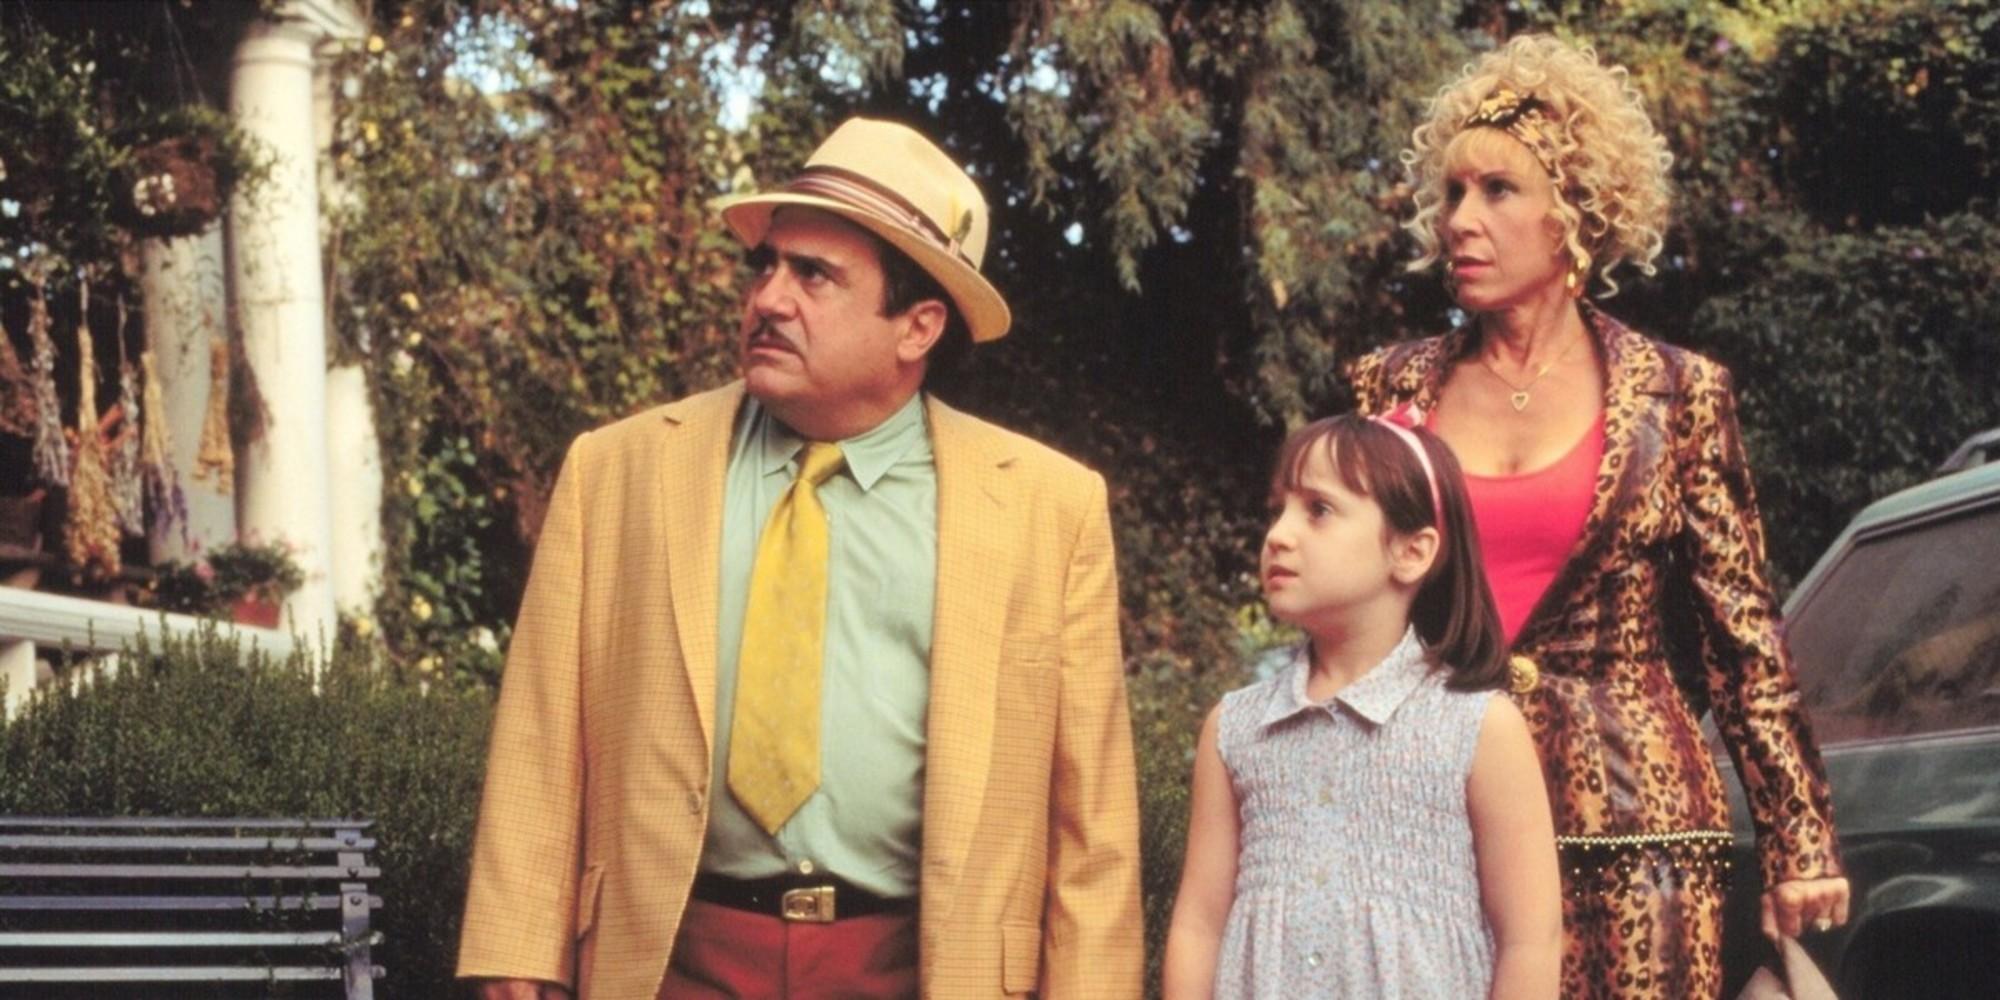 Embeth Davidtz Californication matilda' cast: where are they now?